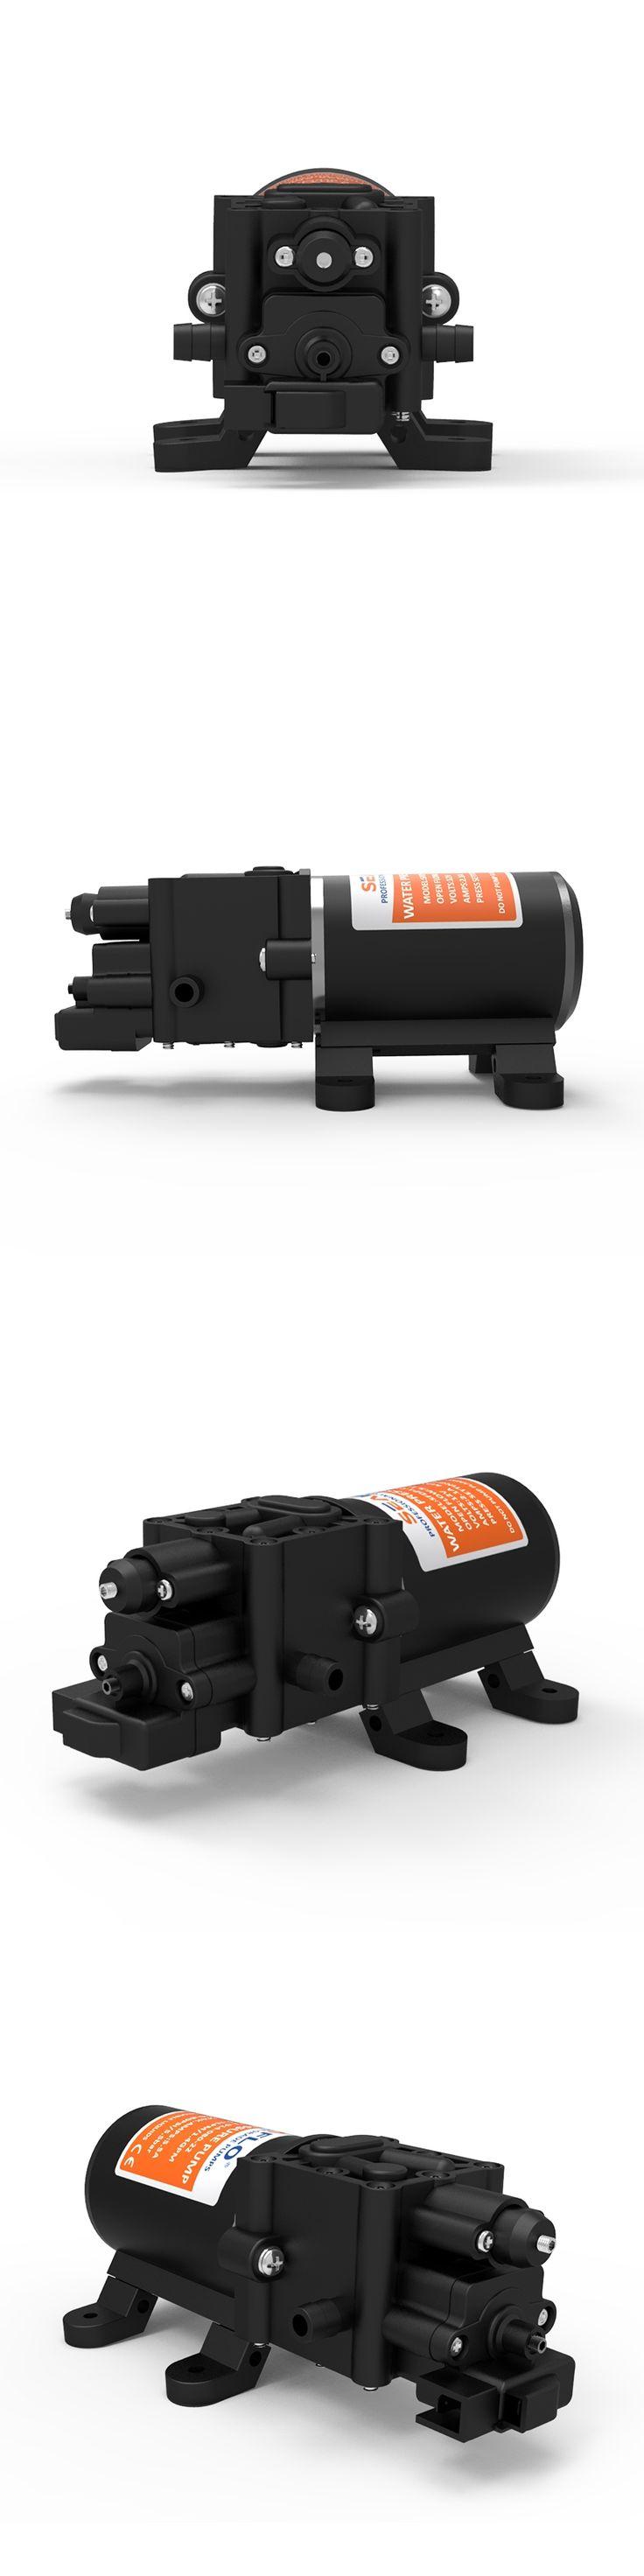 SEAFLO 24 V Water Pressure Pump Self Priming Boat Diaphragm Water transfer Pumps Marine RV